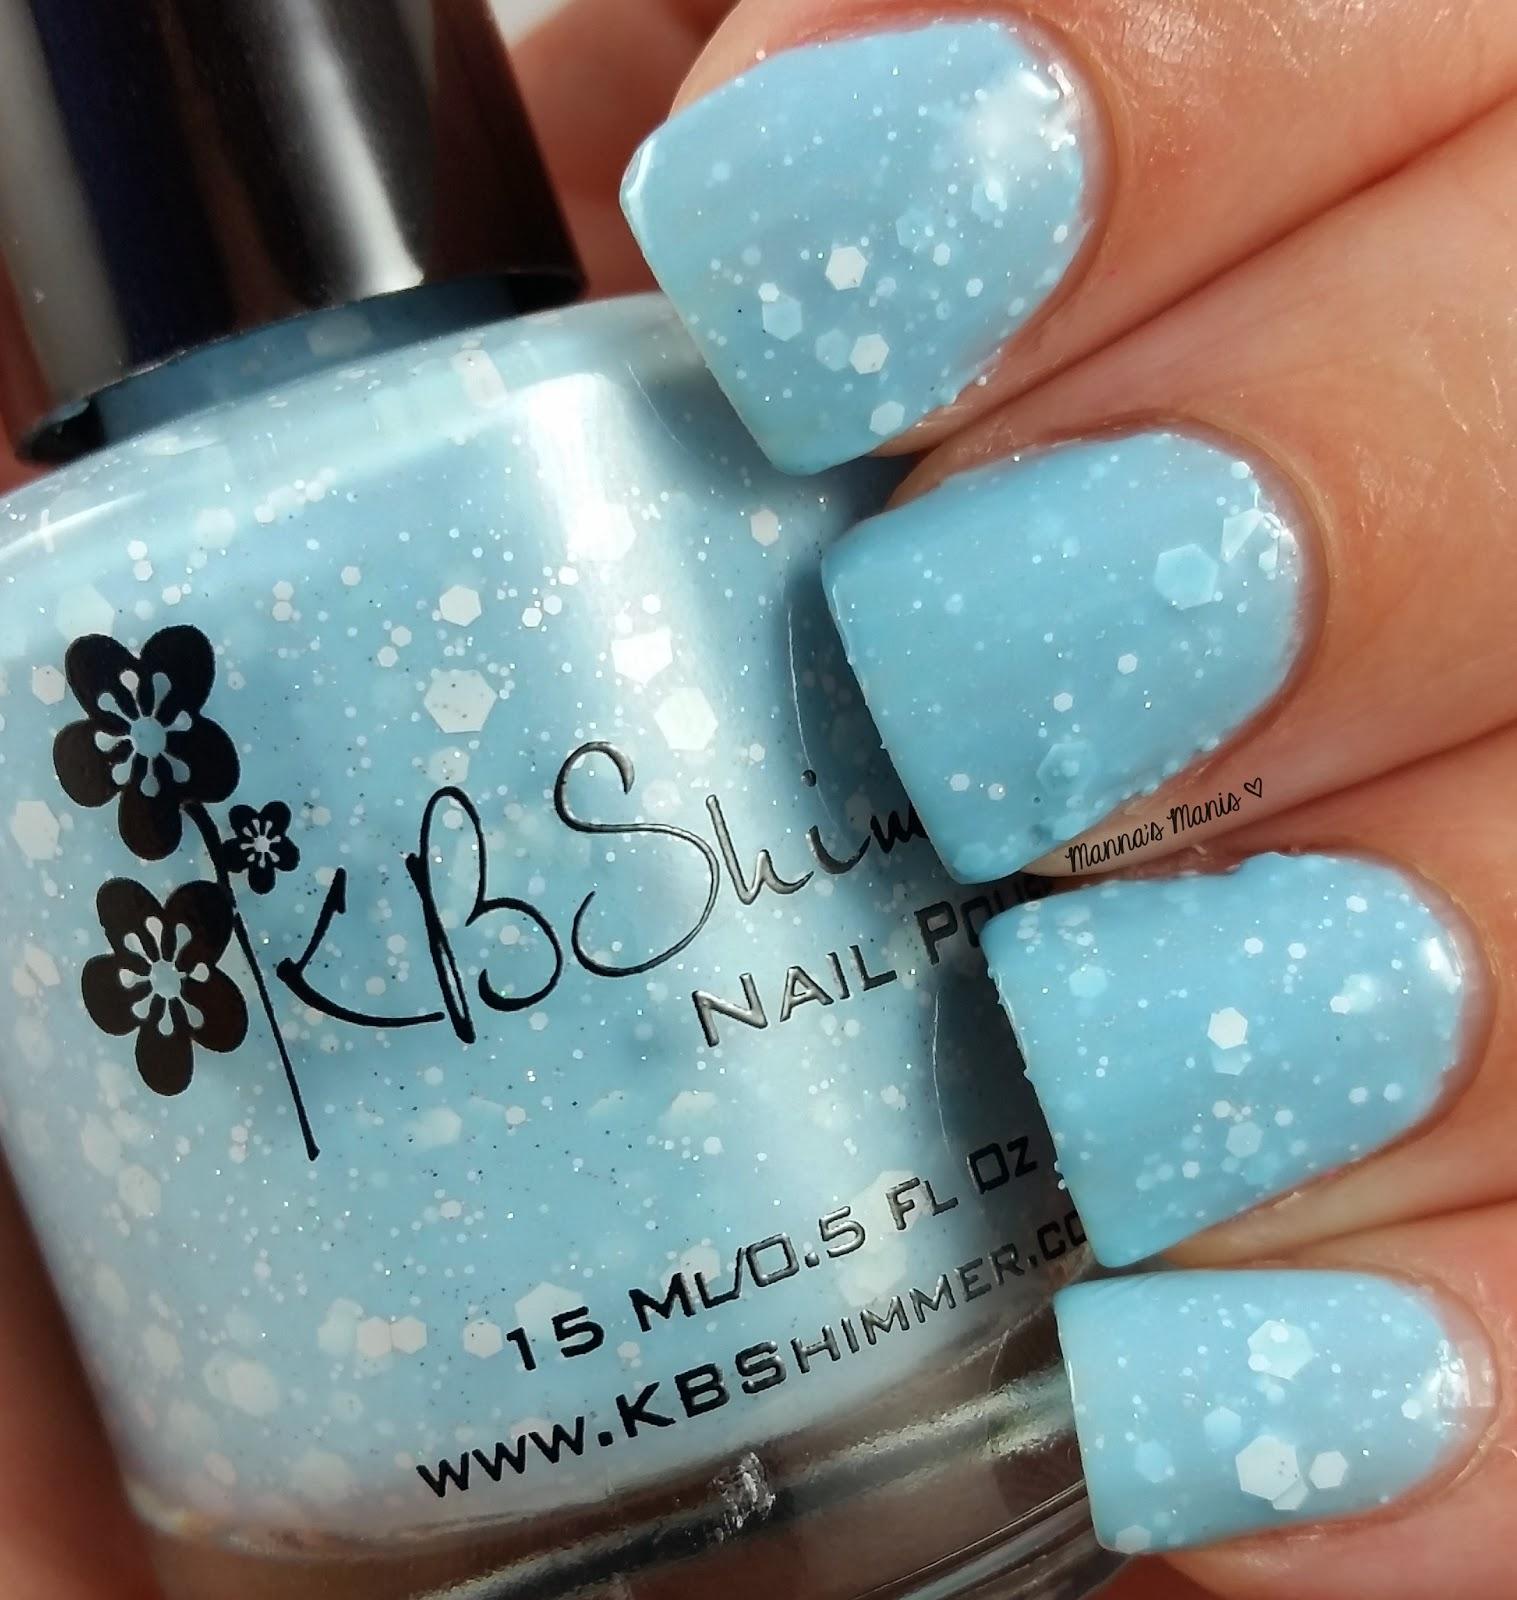 kbshimmer snow way, a pale blue crelly nail polish